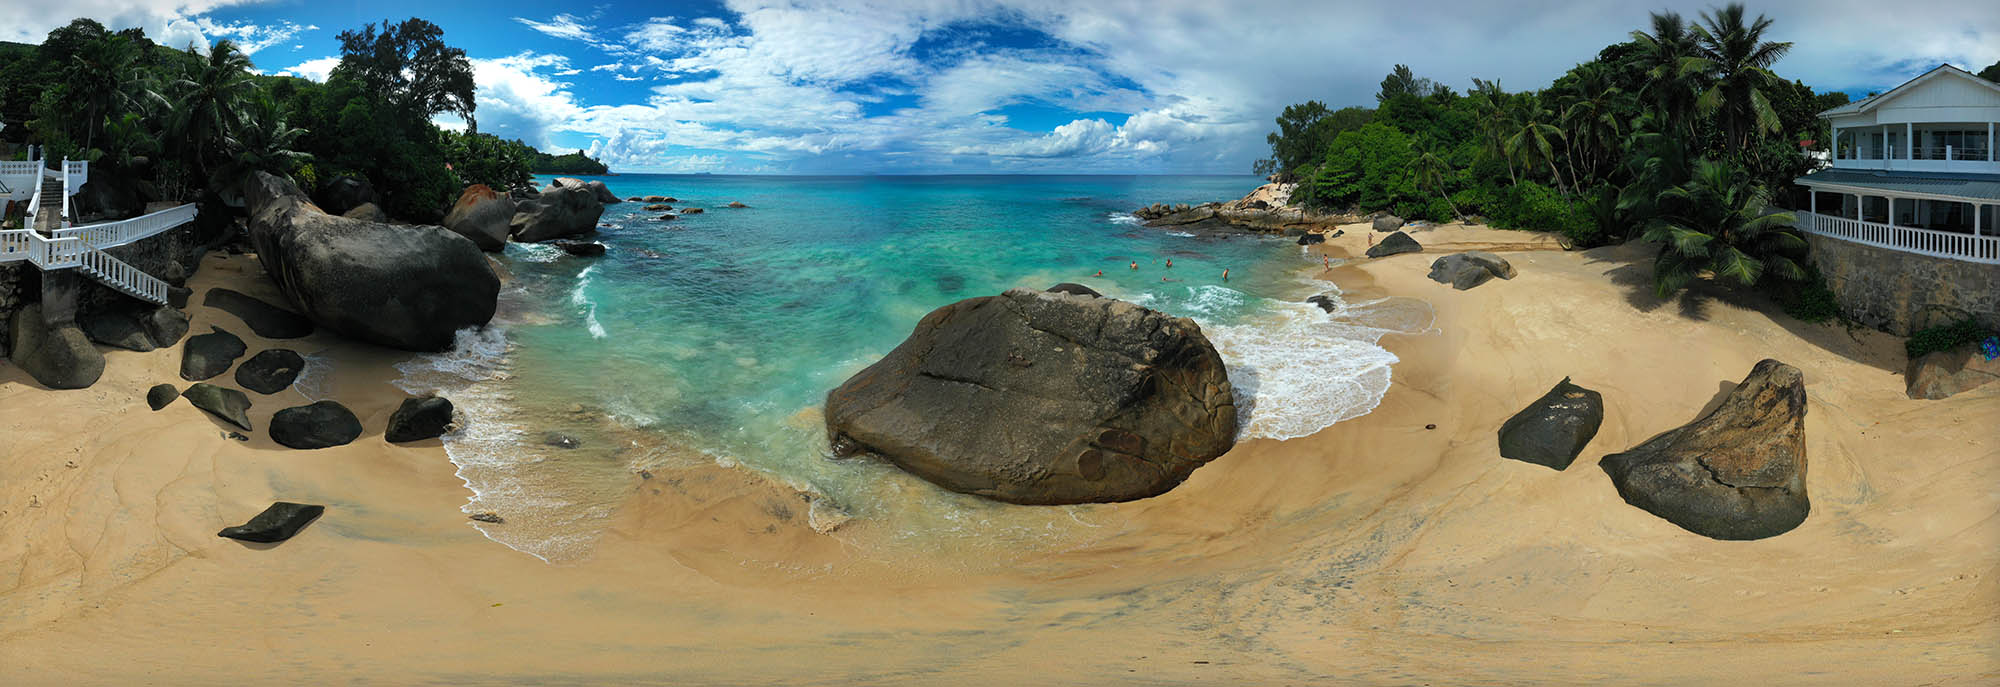 Сейшелы, Индийский океан, пляж, скалы, Борис Резванцев